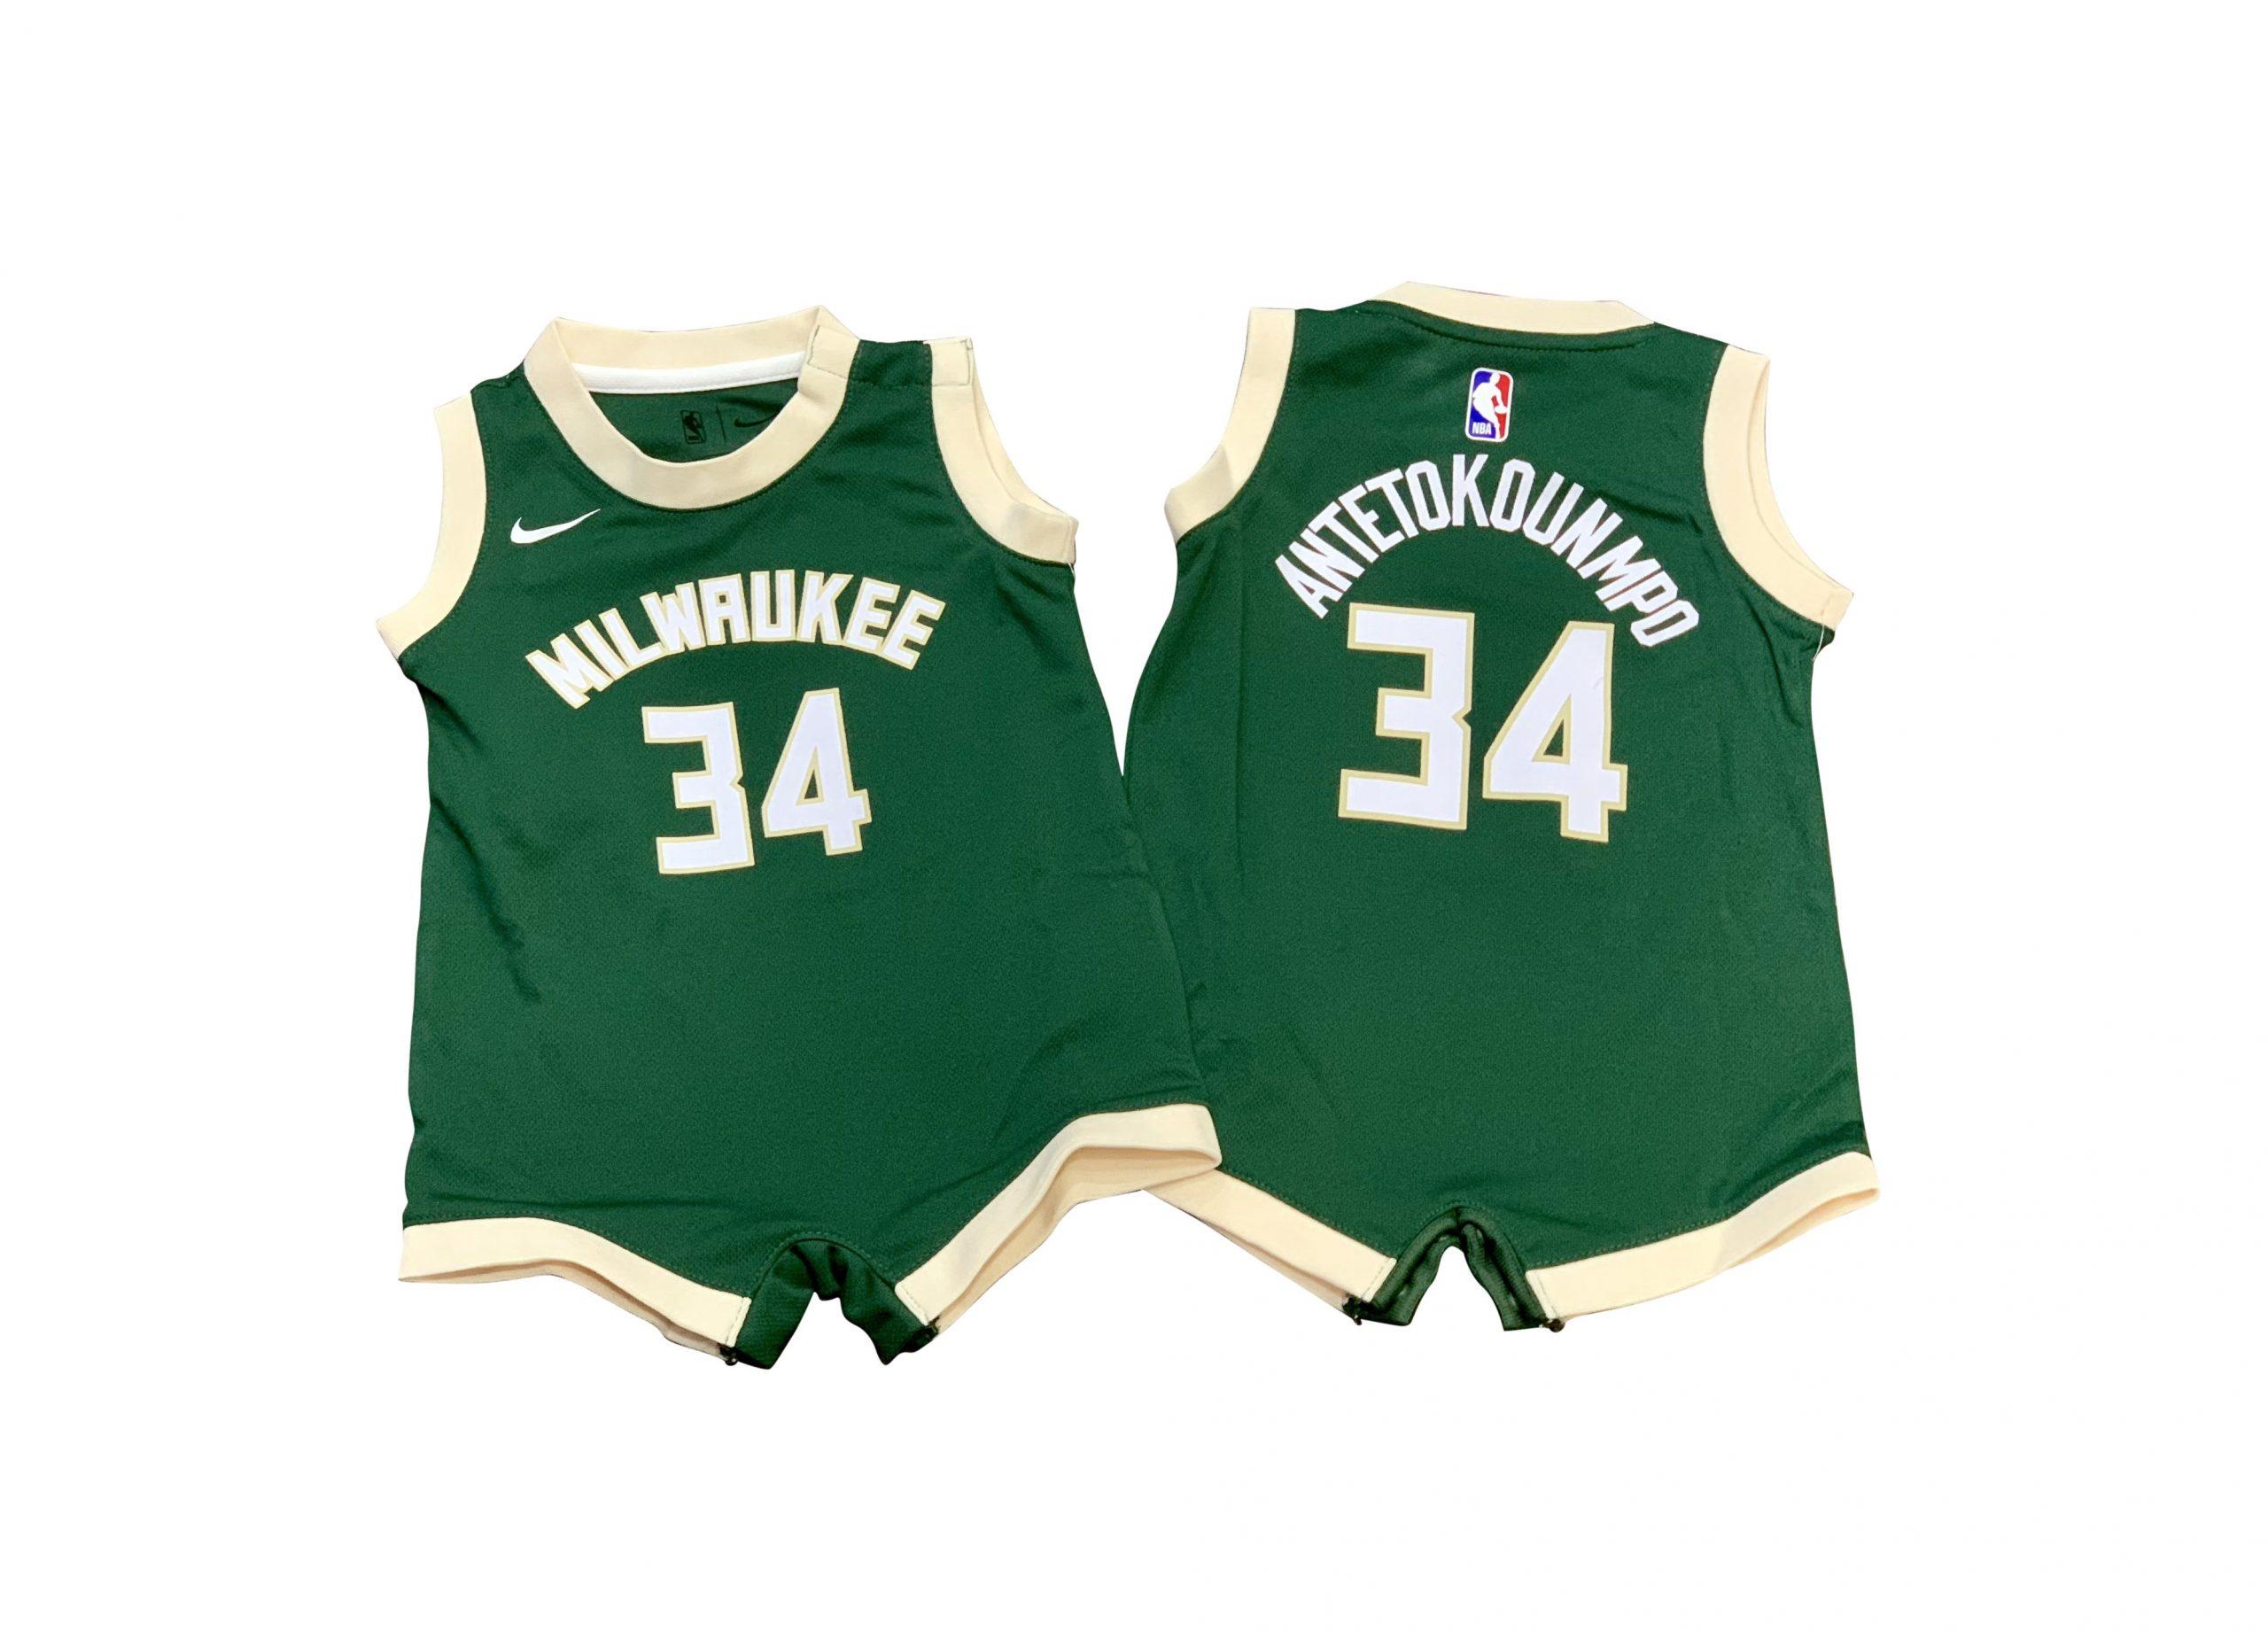 cheap nba jerseys wholesale